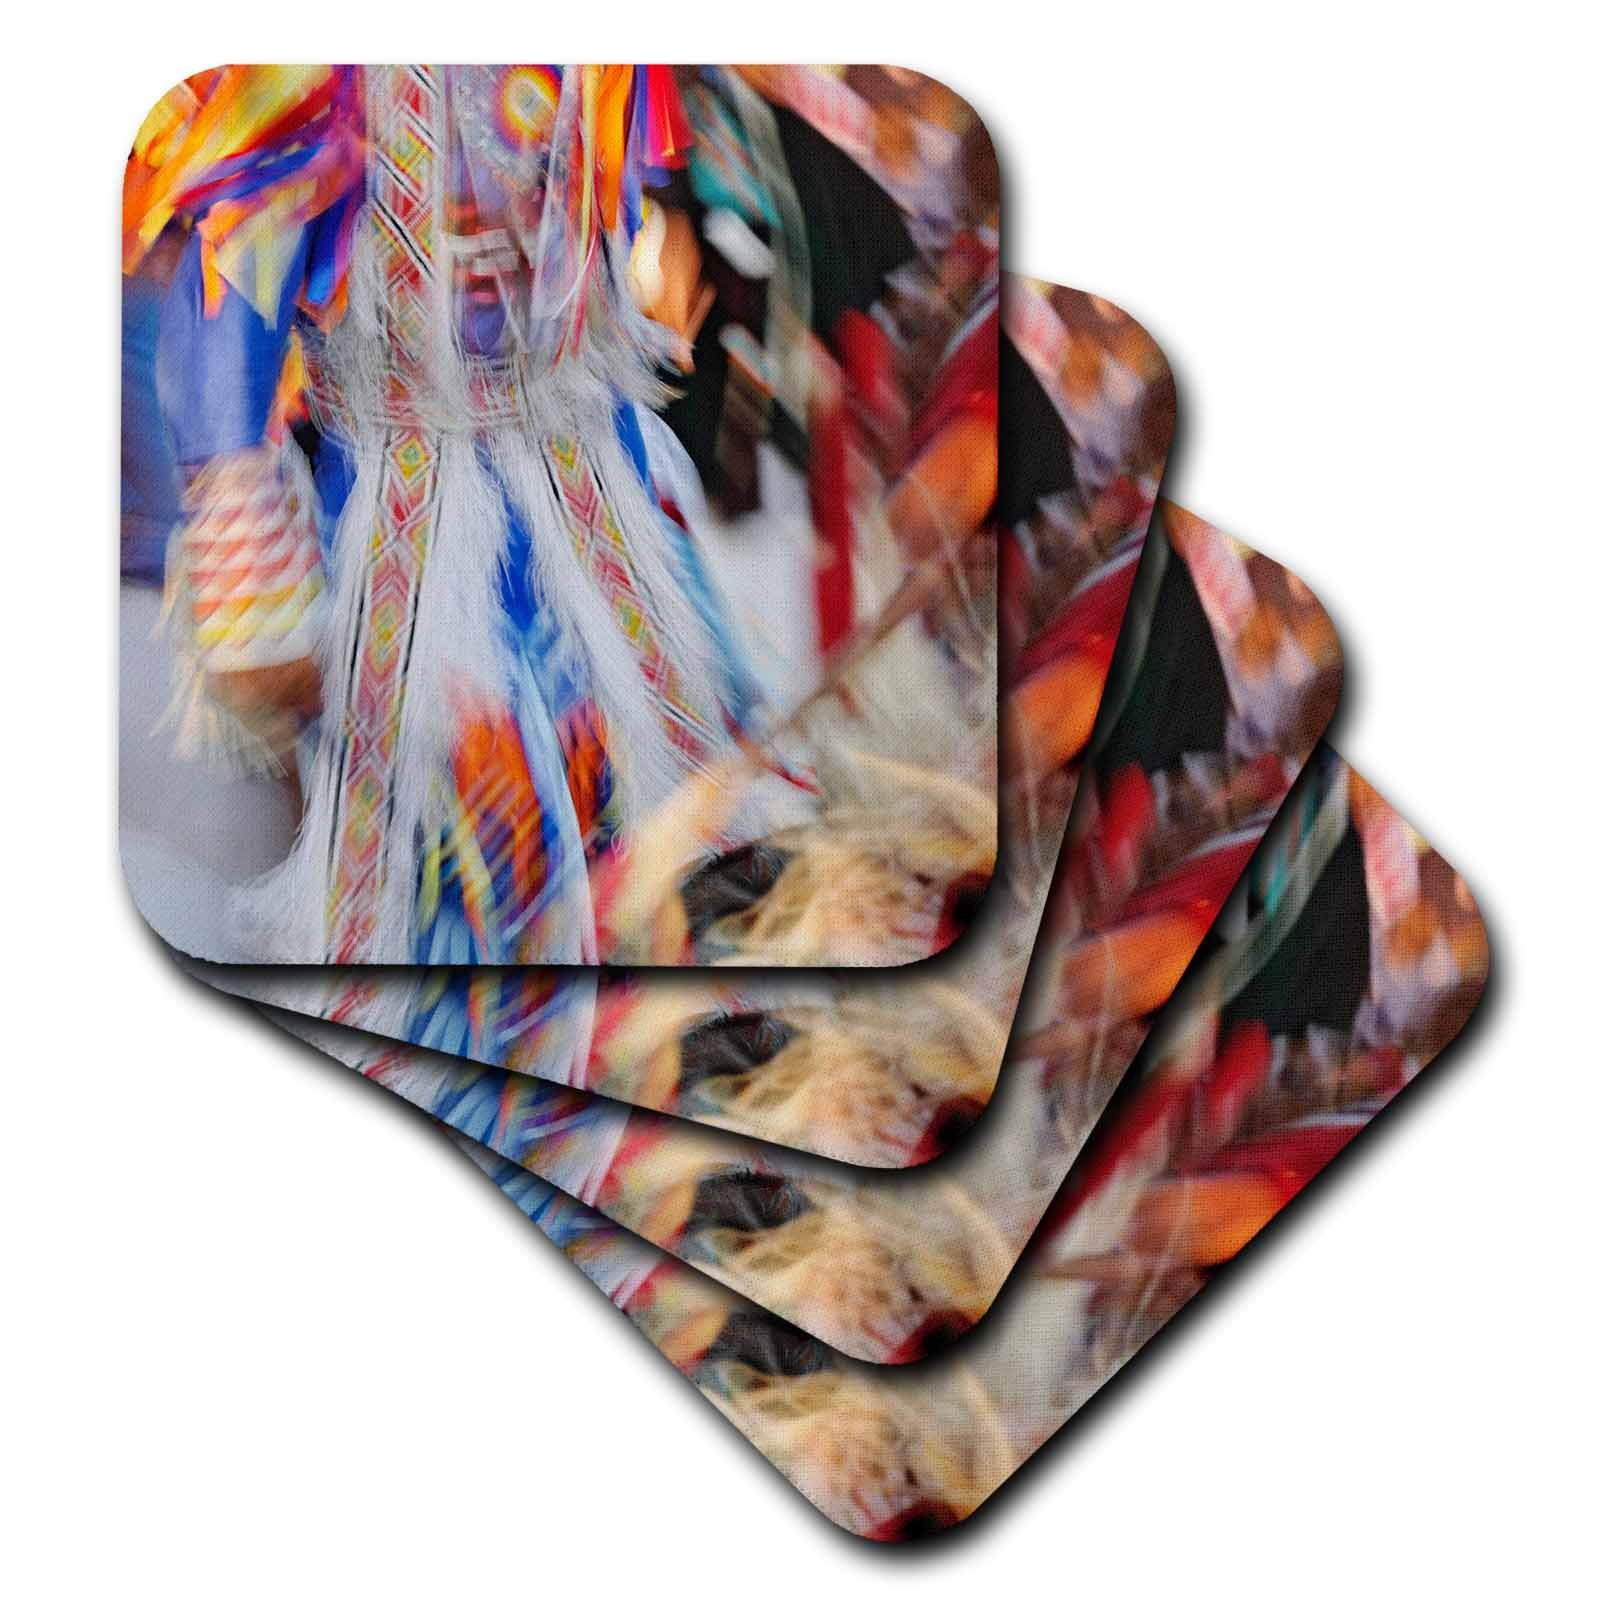 3dRose cst_91580_3 Native American Indian dance, Montana - US27 AJE0095 - Adam Jones - Ceramic Tile Coasters, Set of 4